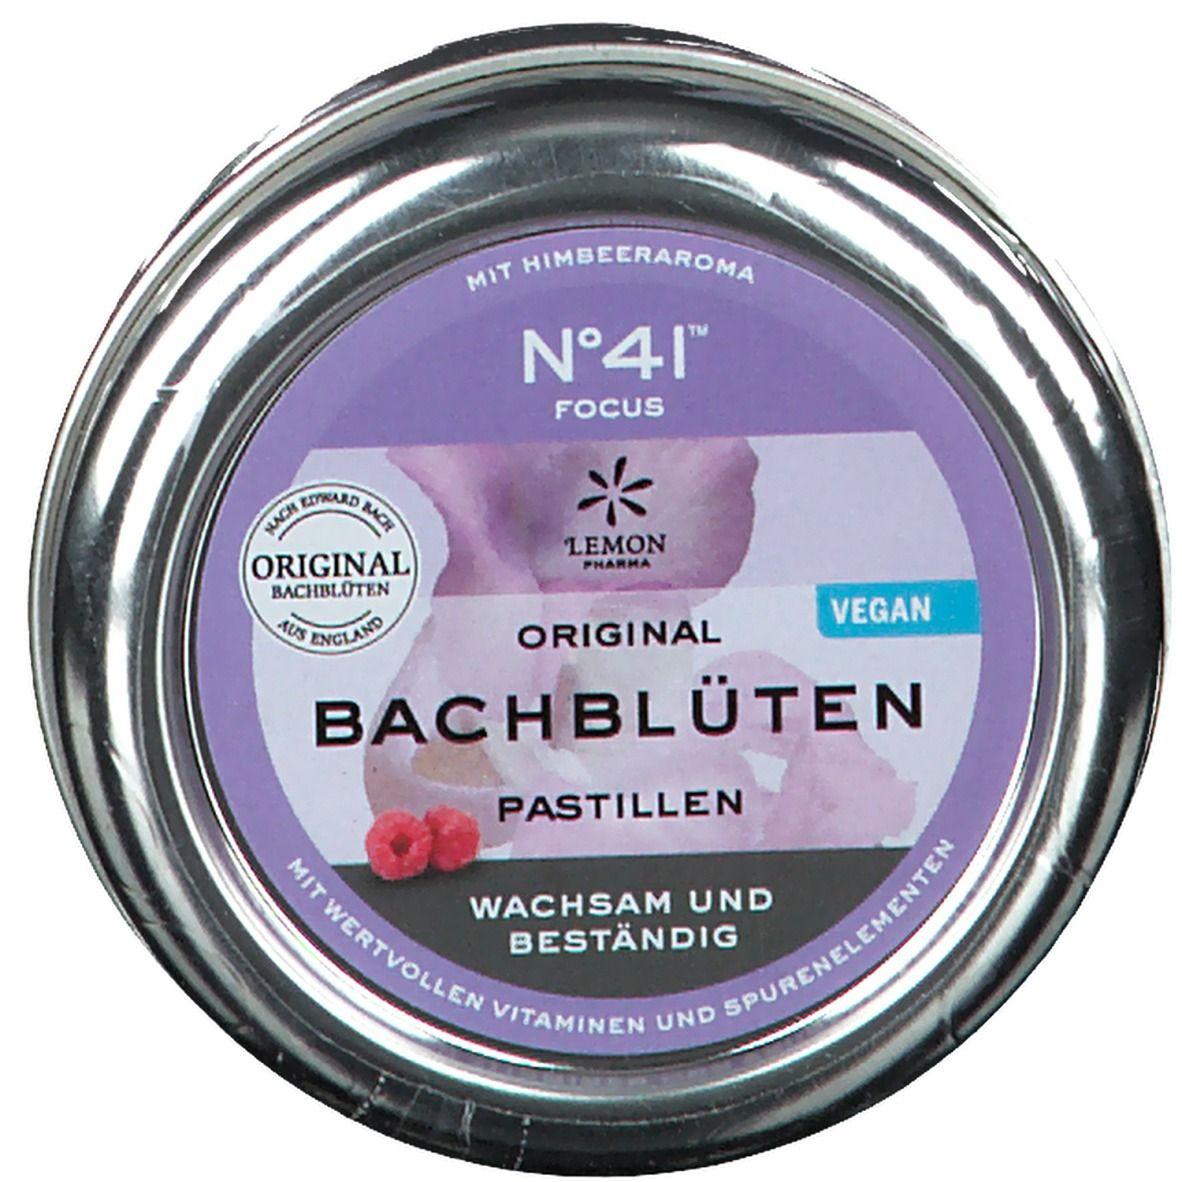 No. 41® Konzentration Original Bachblüten Pastillen